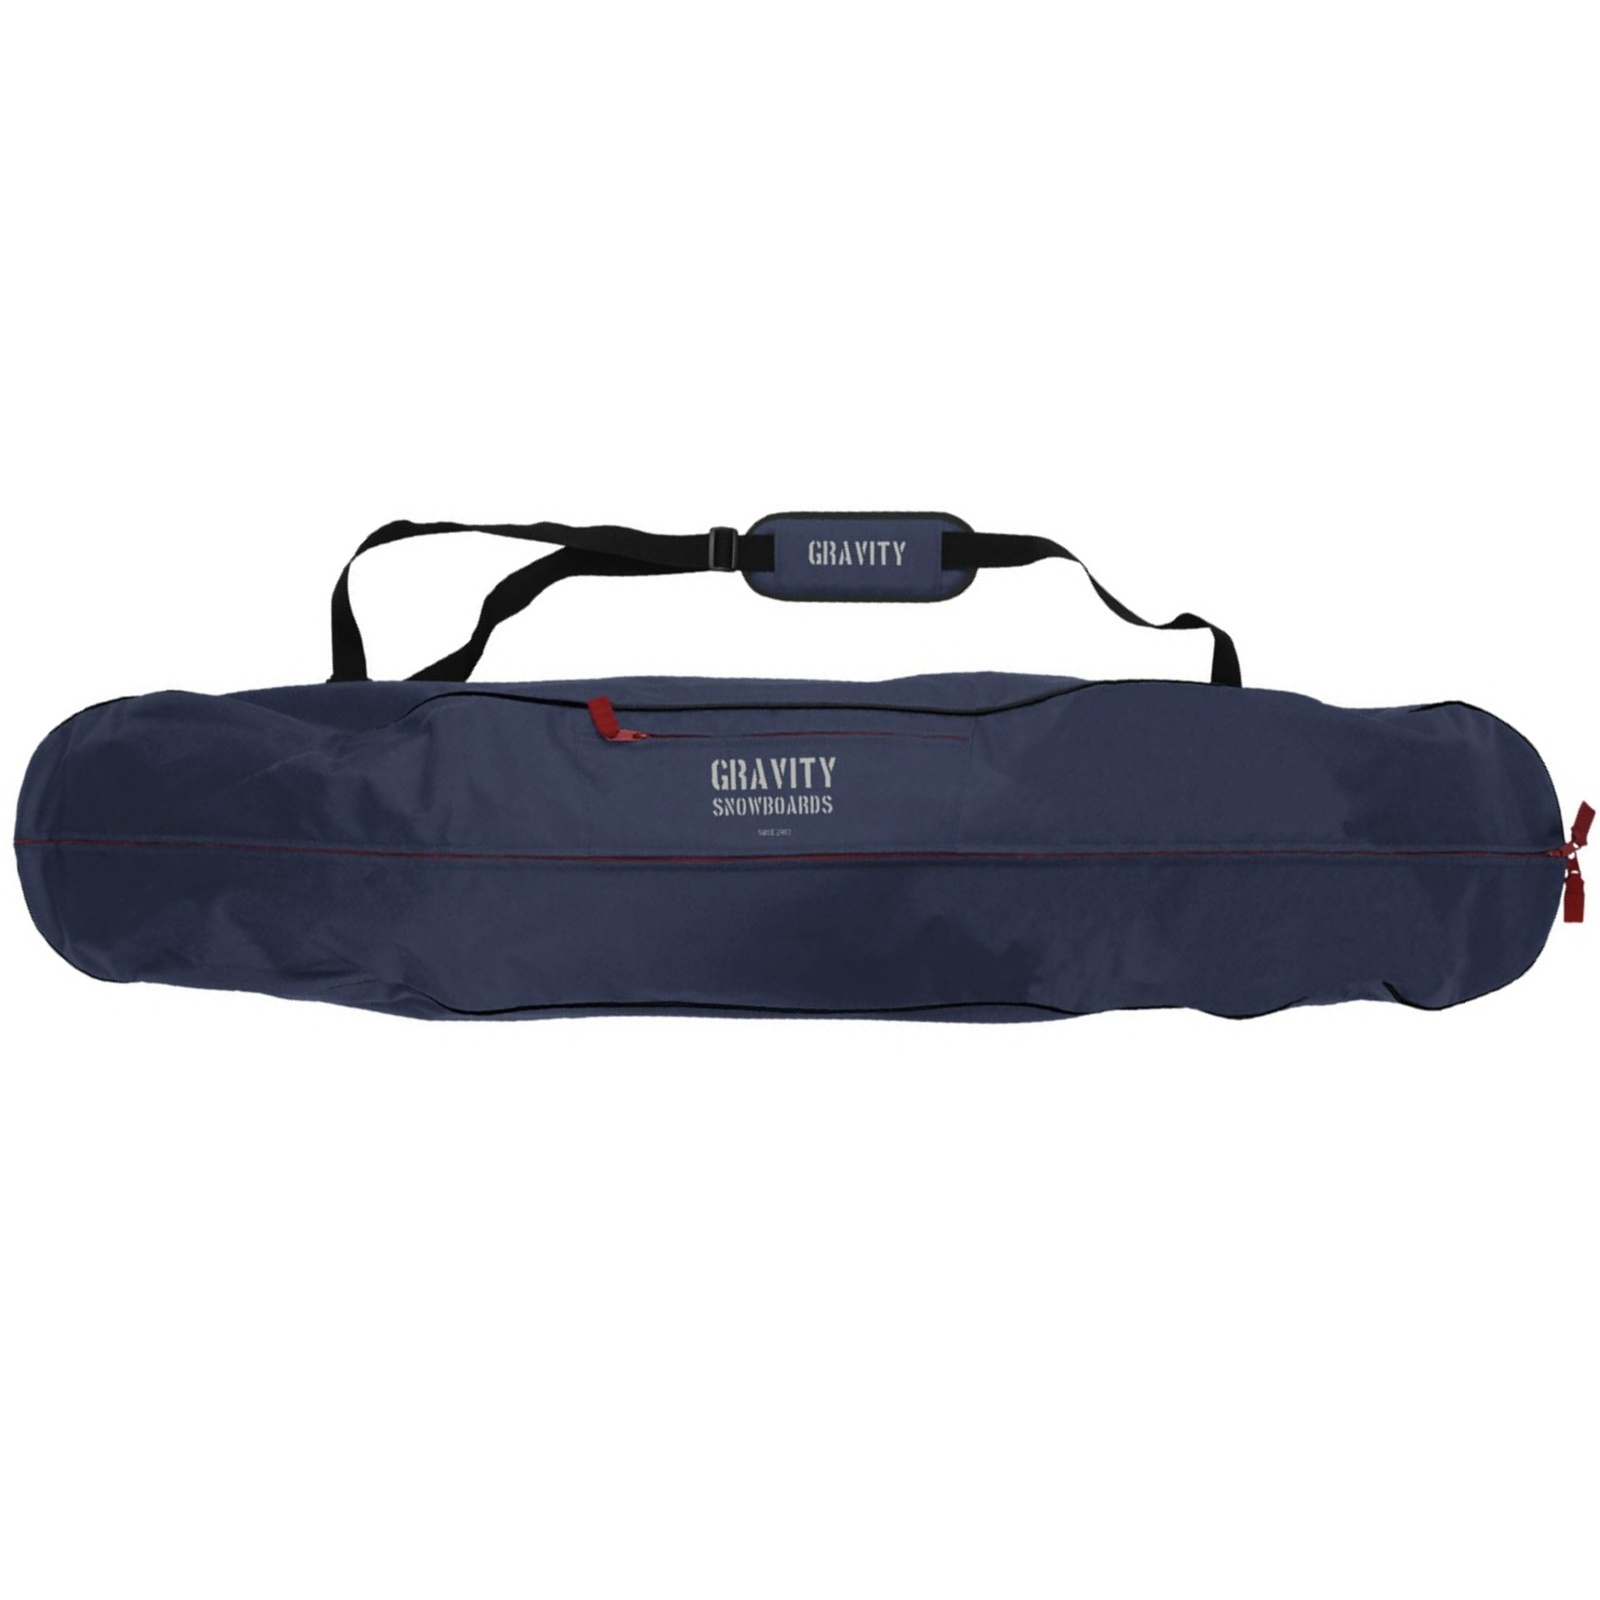 Obal na snowboard GRAVITY Scout modrý - vel. 165 cm